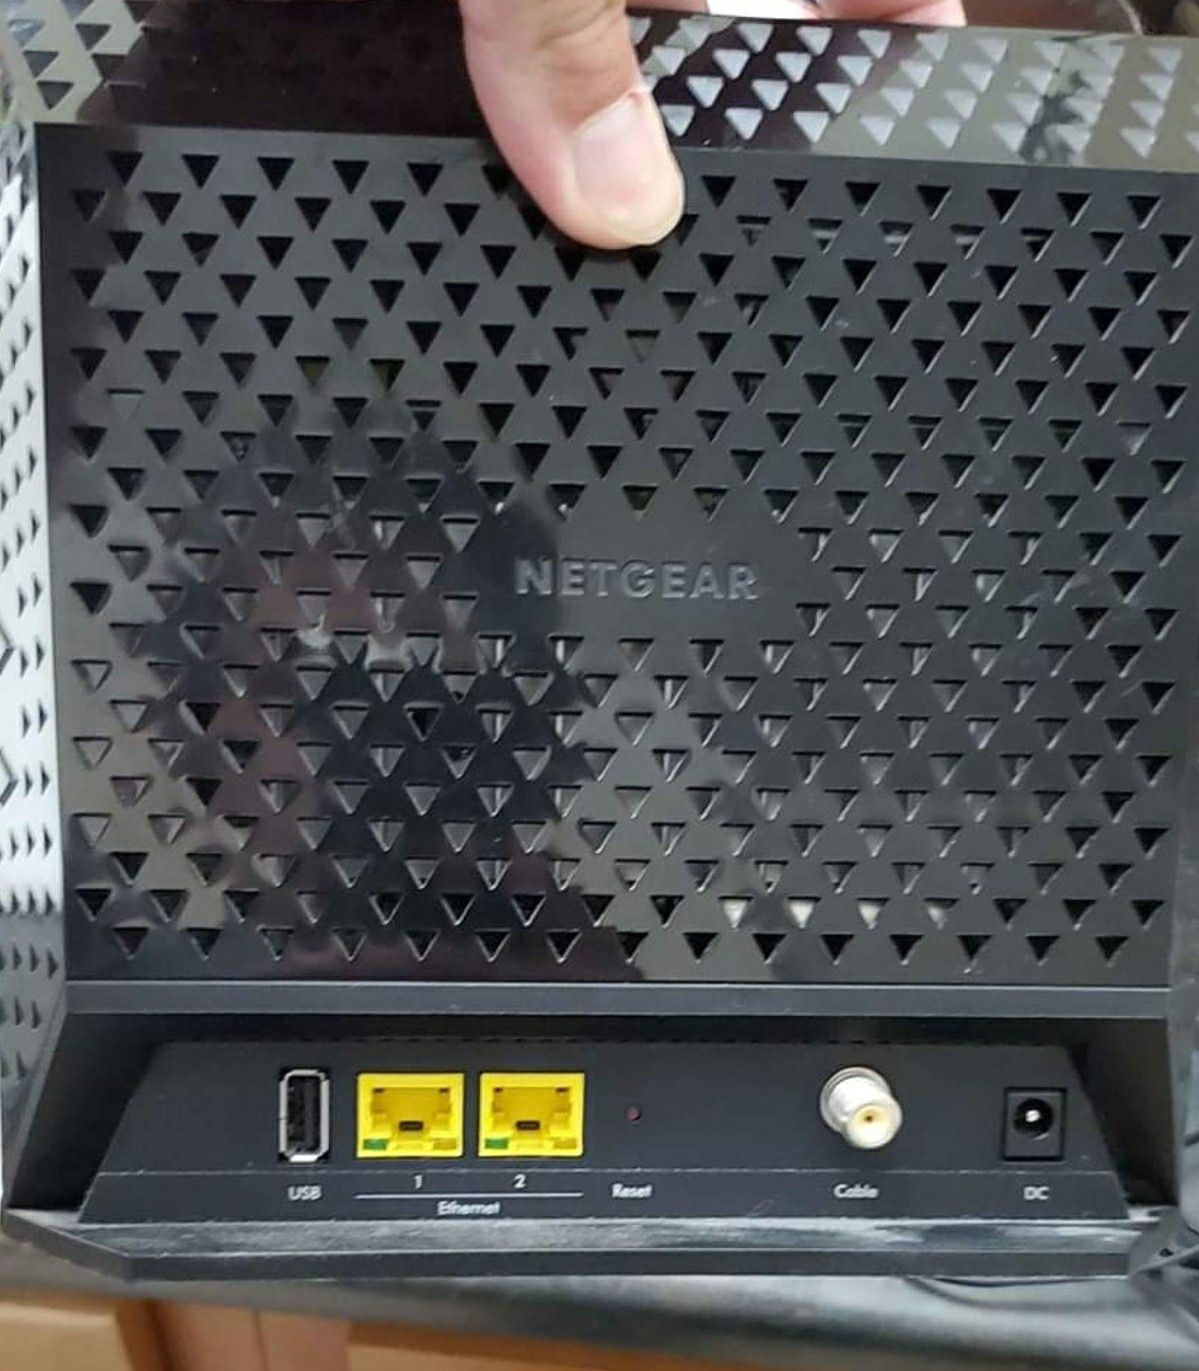 Netgear AC1600 Cable Router